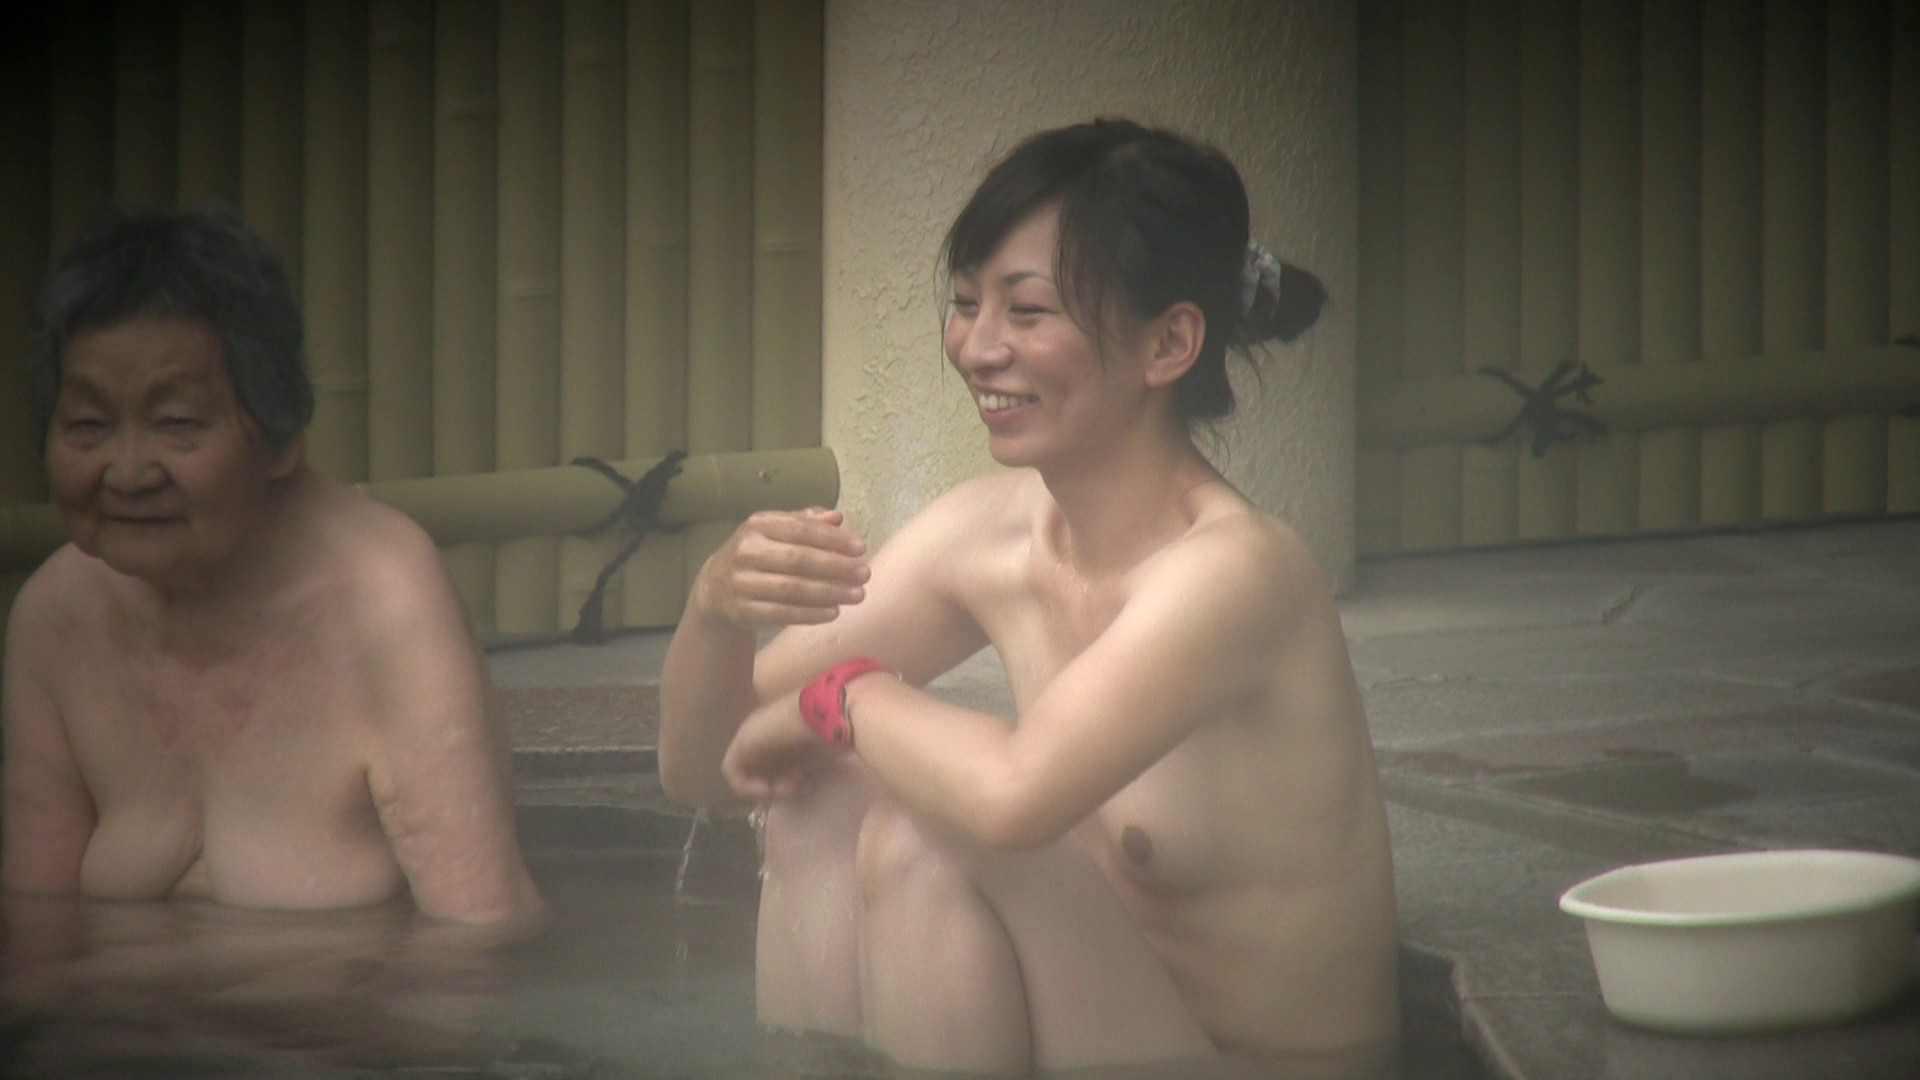 Aquaな露天風呂Vol.156 エロいOL オメコ無修正動画無料 22枚